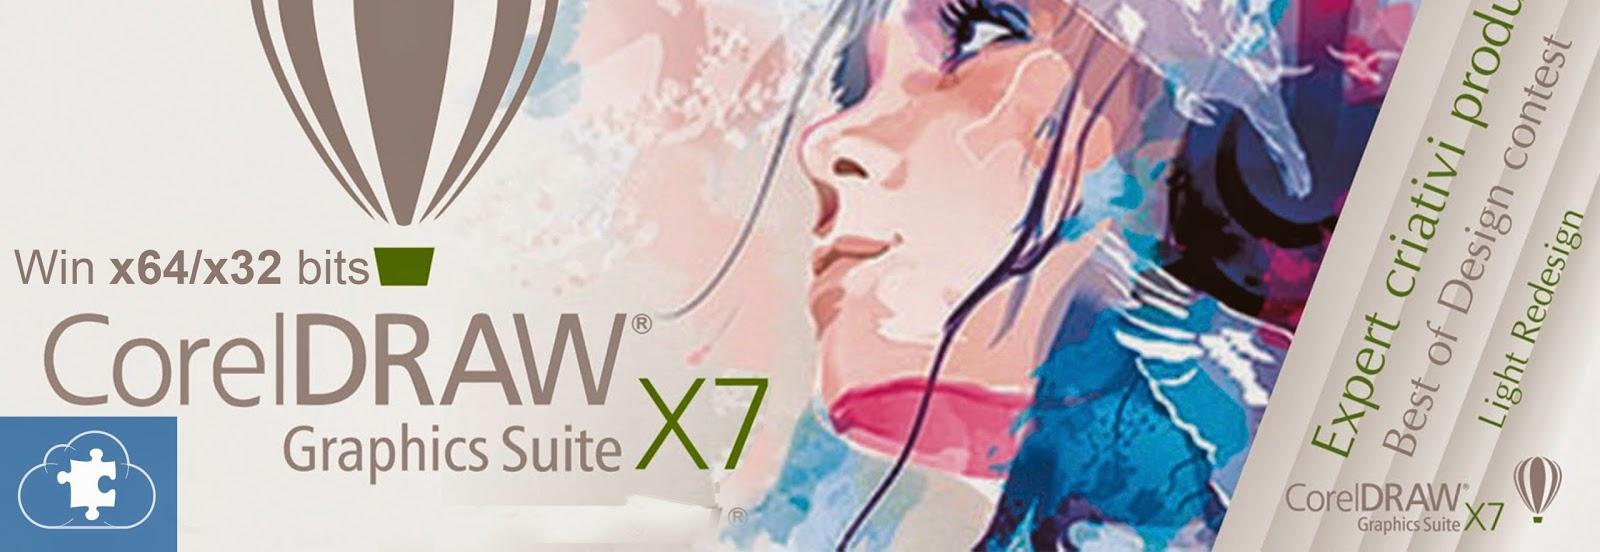 CorelDRAW Graphics Suite X7 | Win x64/x32 bits | ESPAÑOL - INGLES